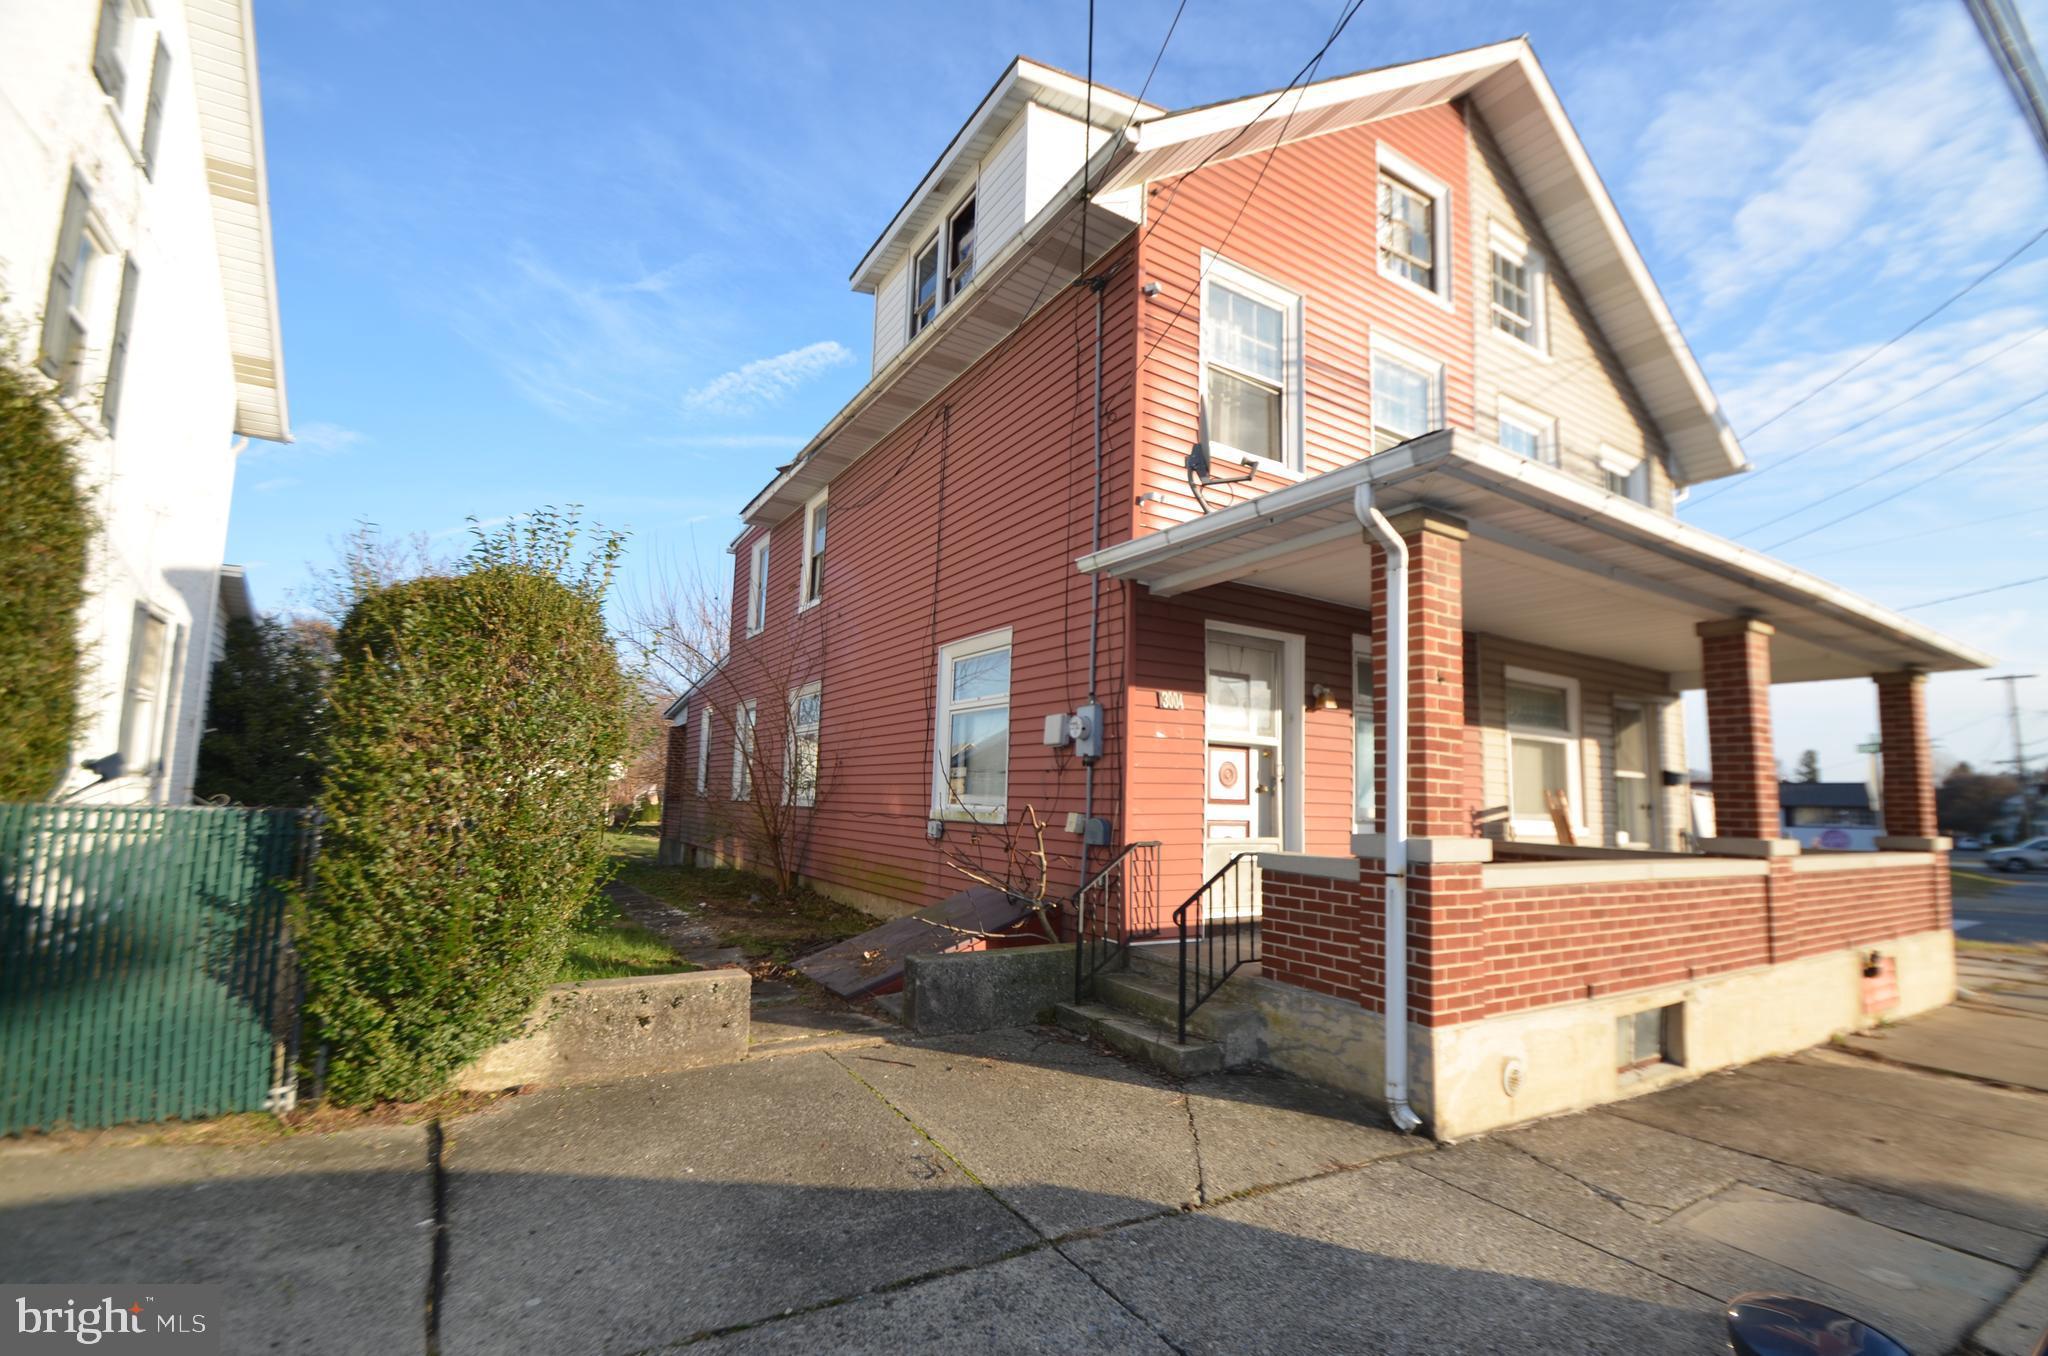 3004 N 2ND STREET, WHITEHALL, PA 18052